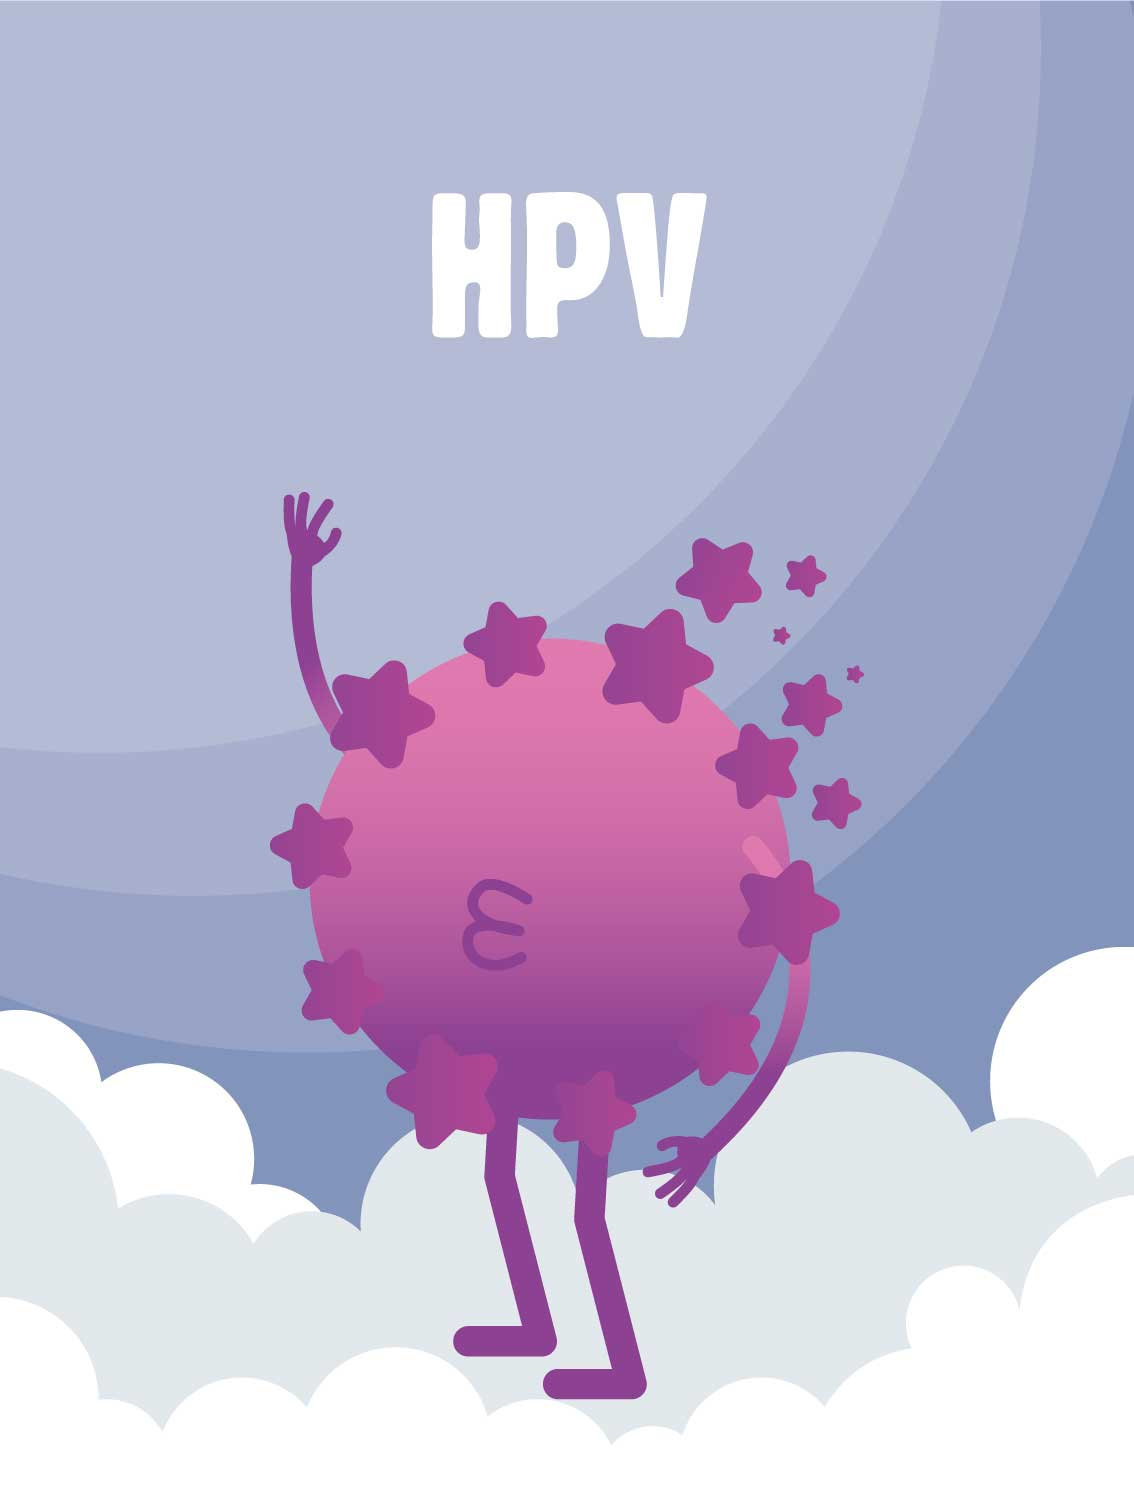 depistage papillomavirus chez les hommes